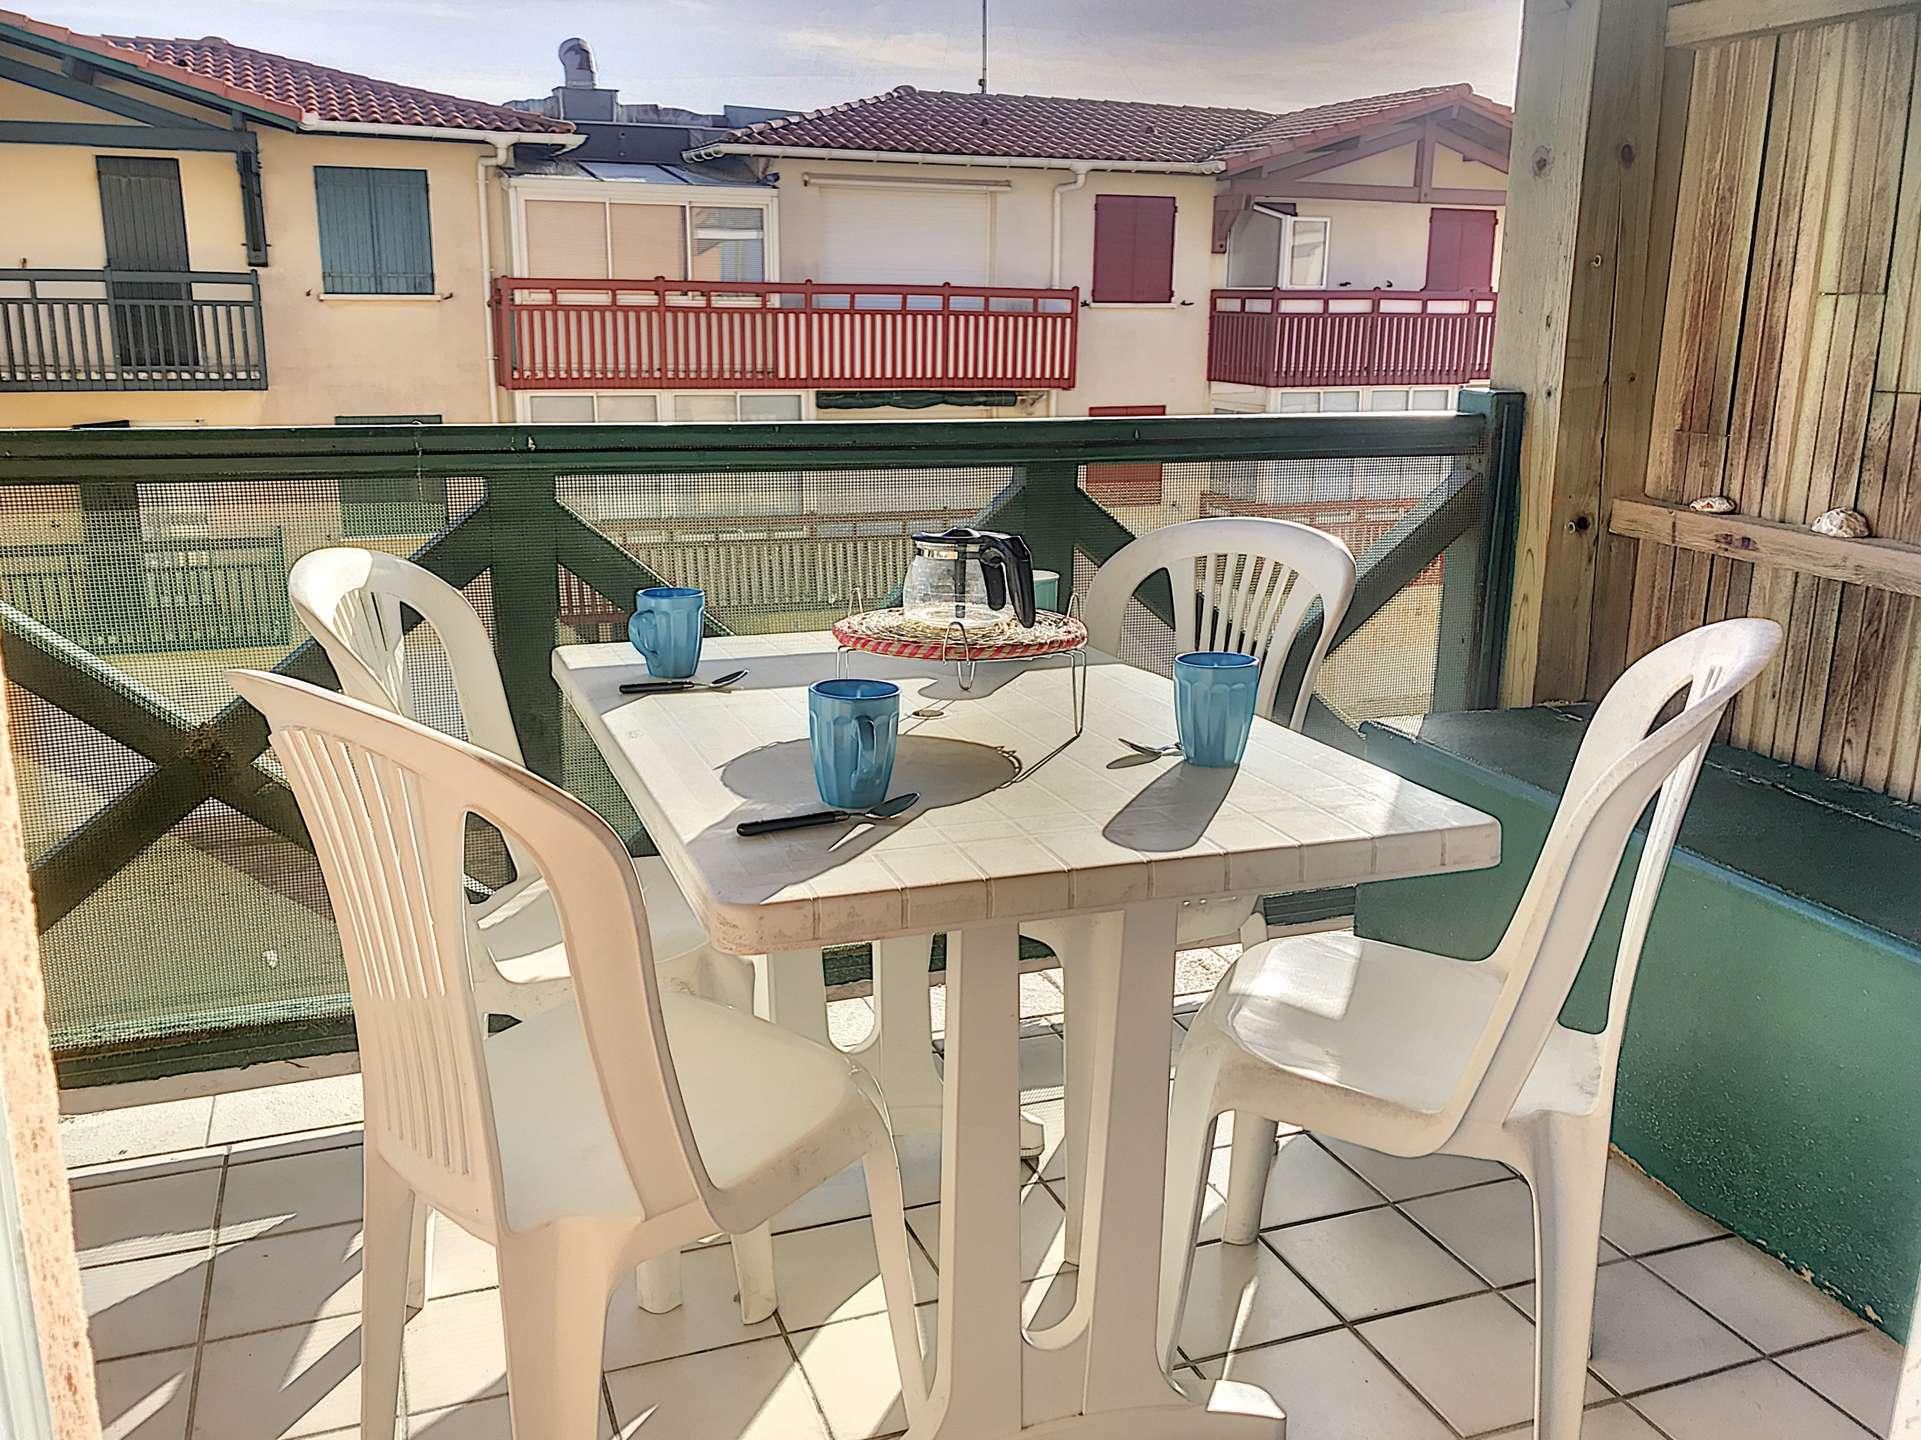 Appartement to rent in Vieux Boucau